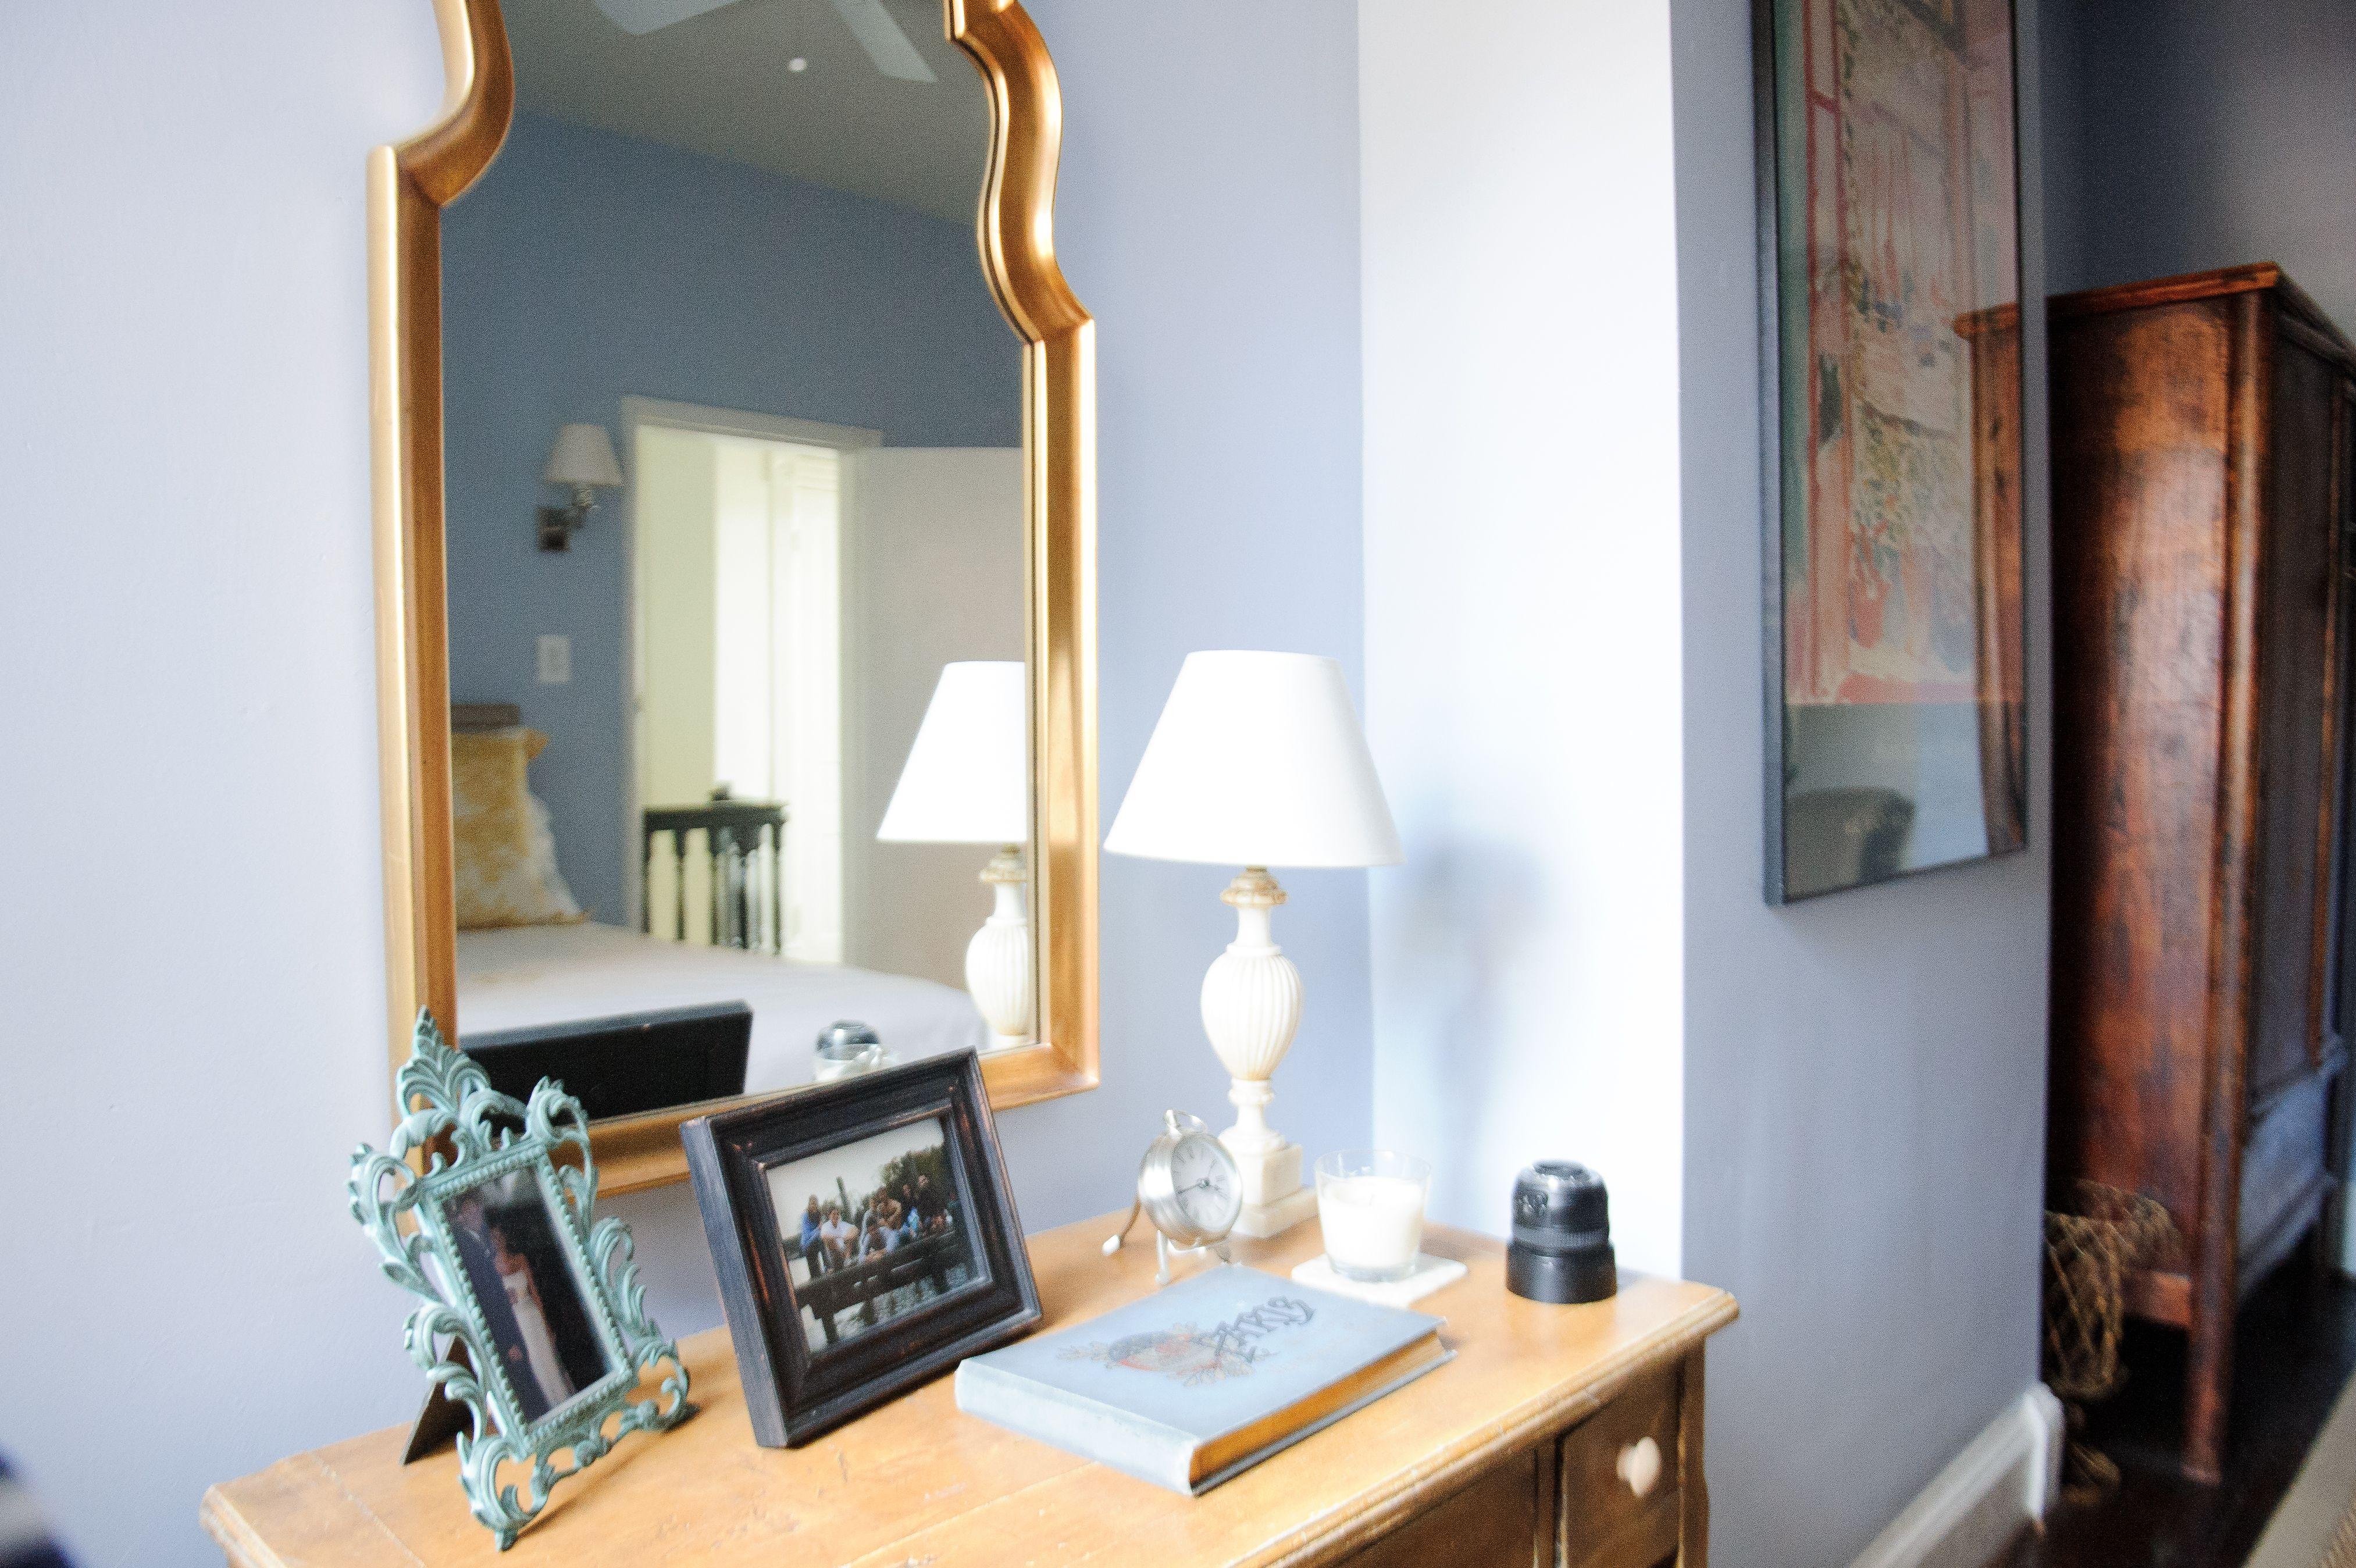 Kathryn iveyus washington dc home tour blue bedrooms dresser